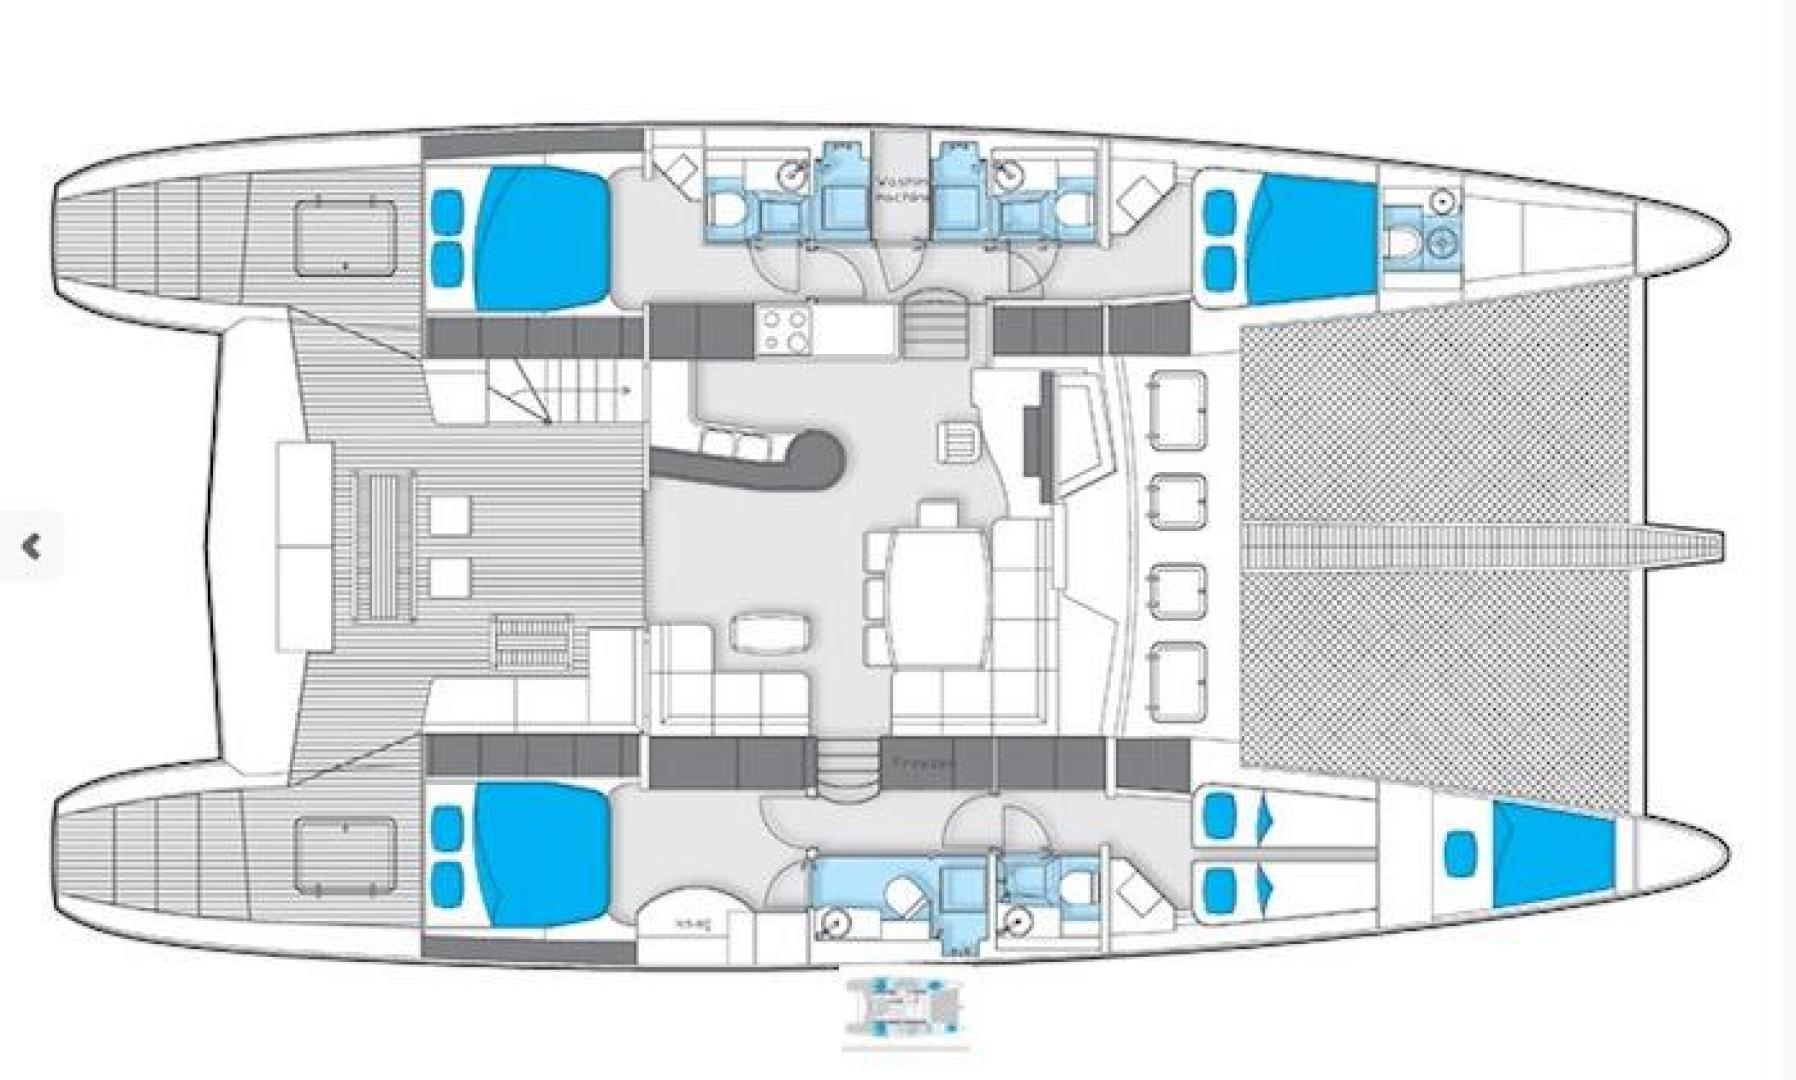 Sunreef 62 layout